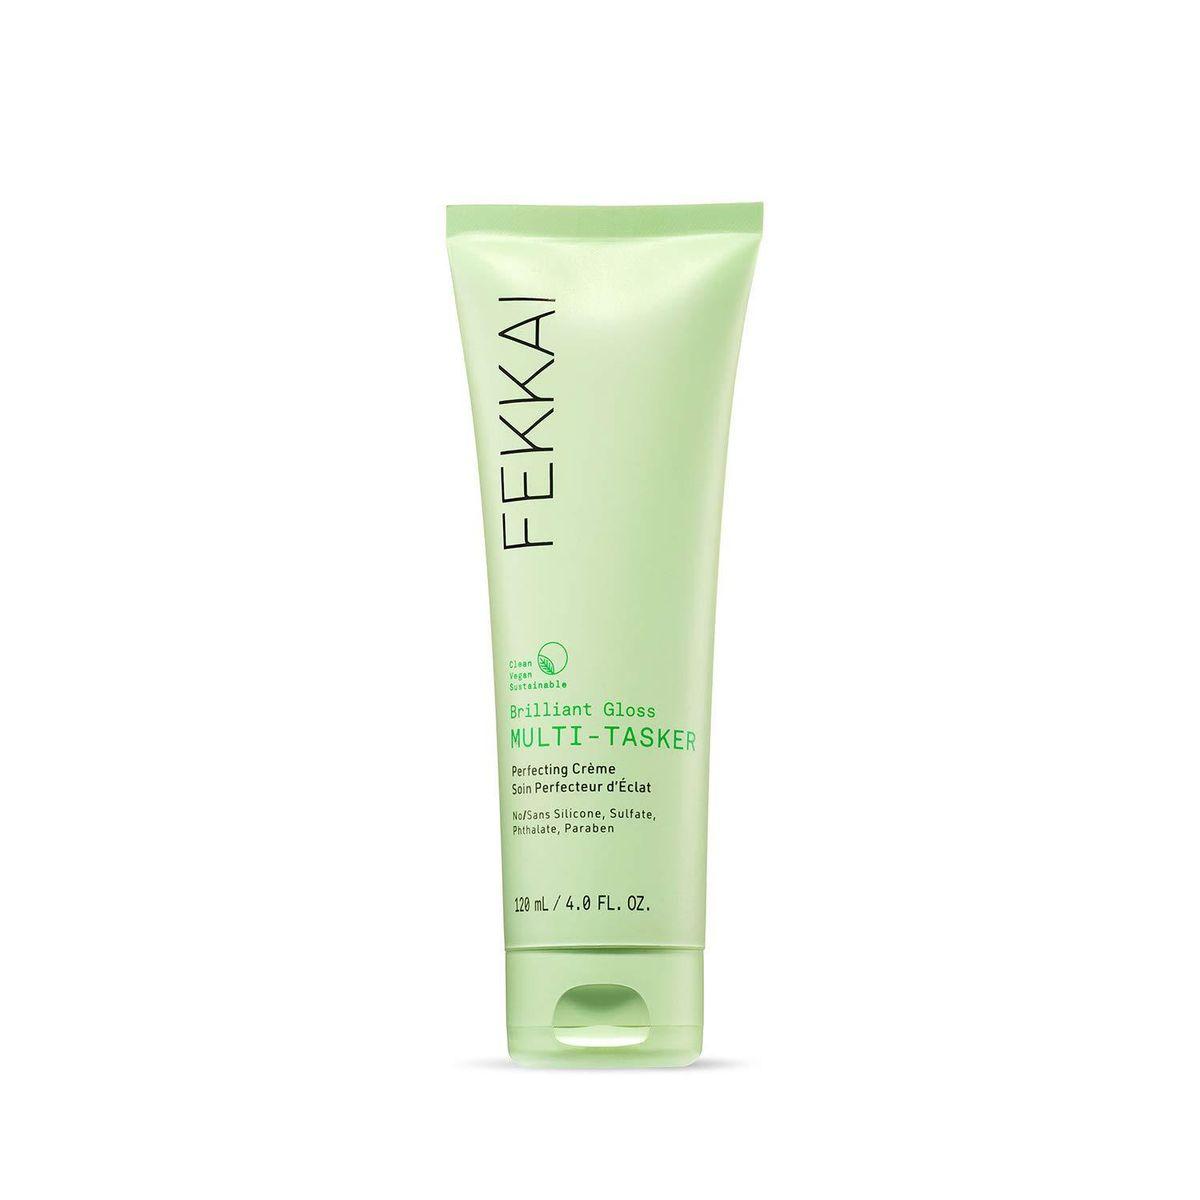 Brilliant Gloss Multi-Tasker Perfecting Cream